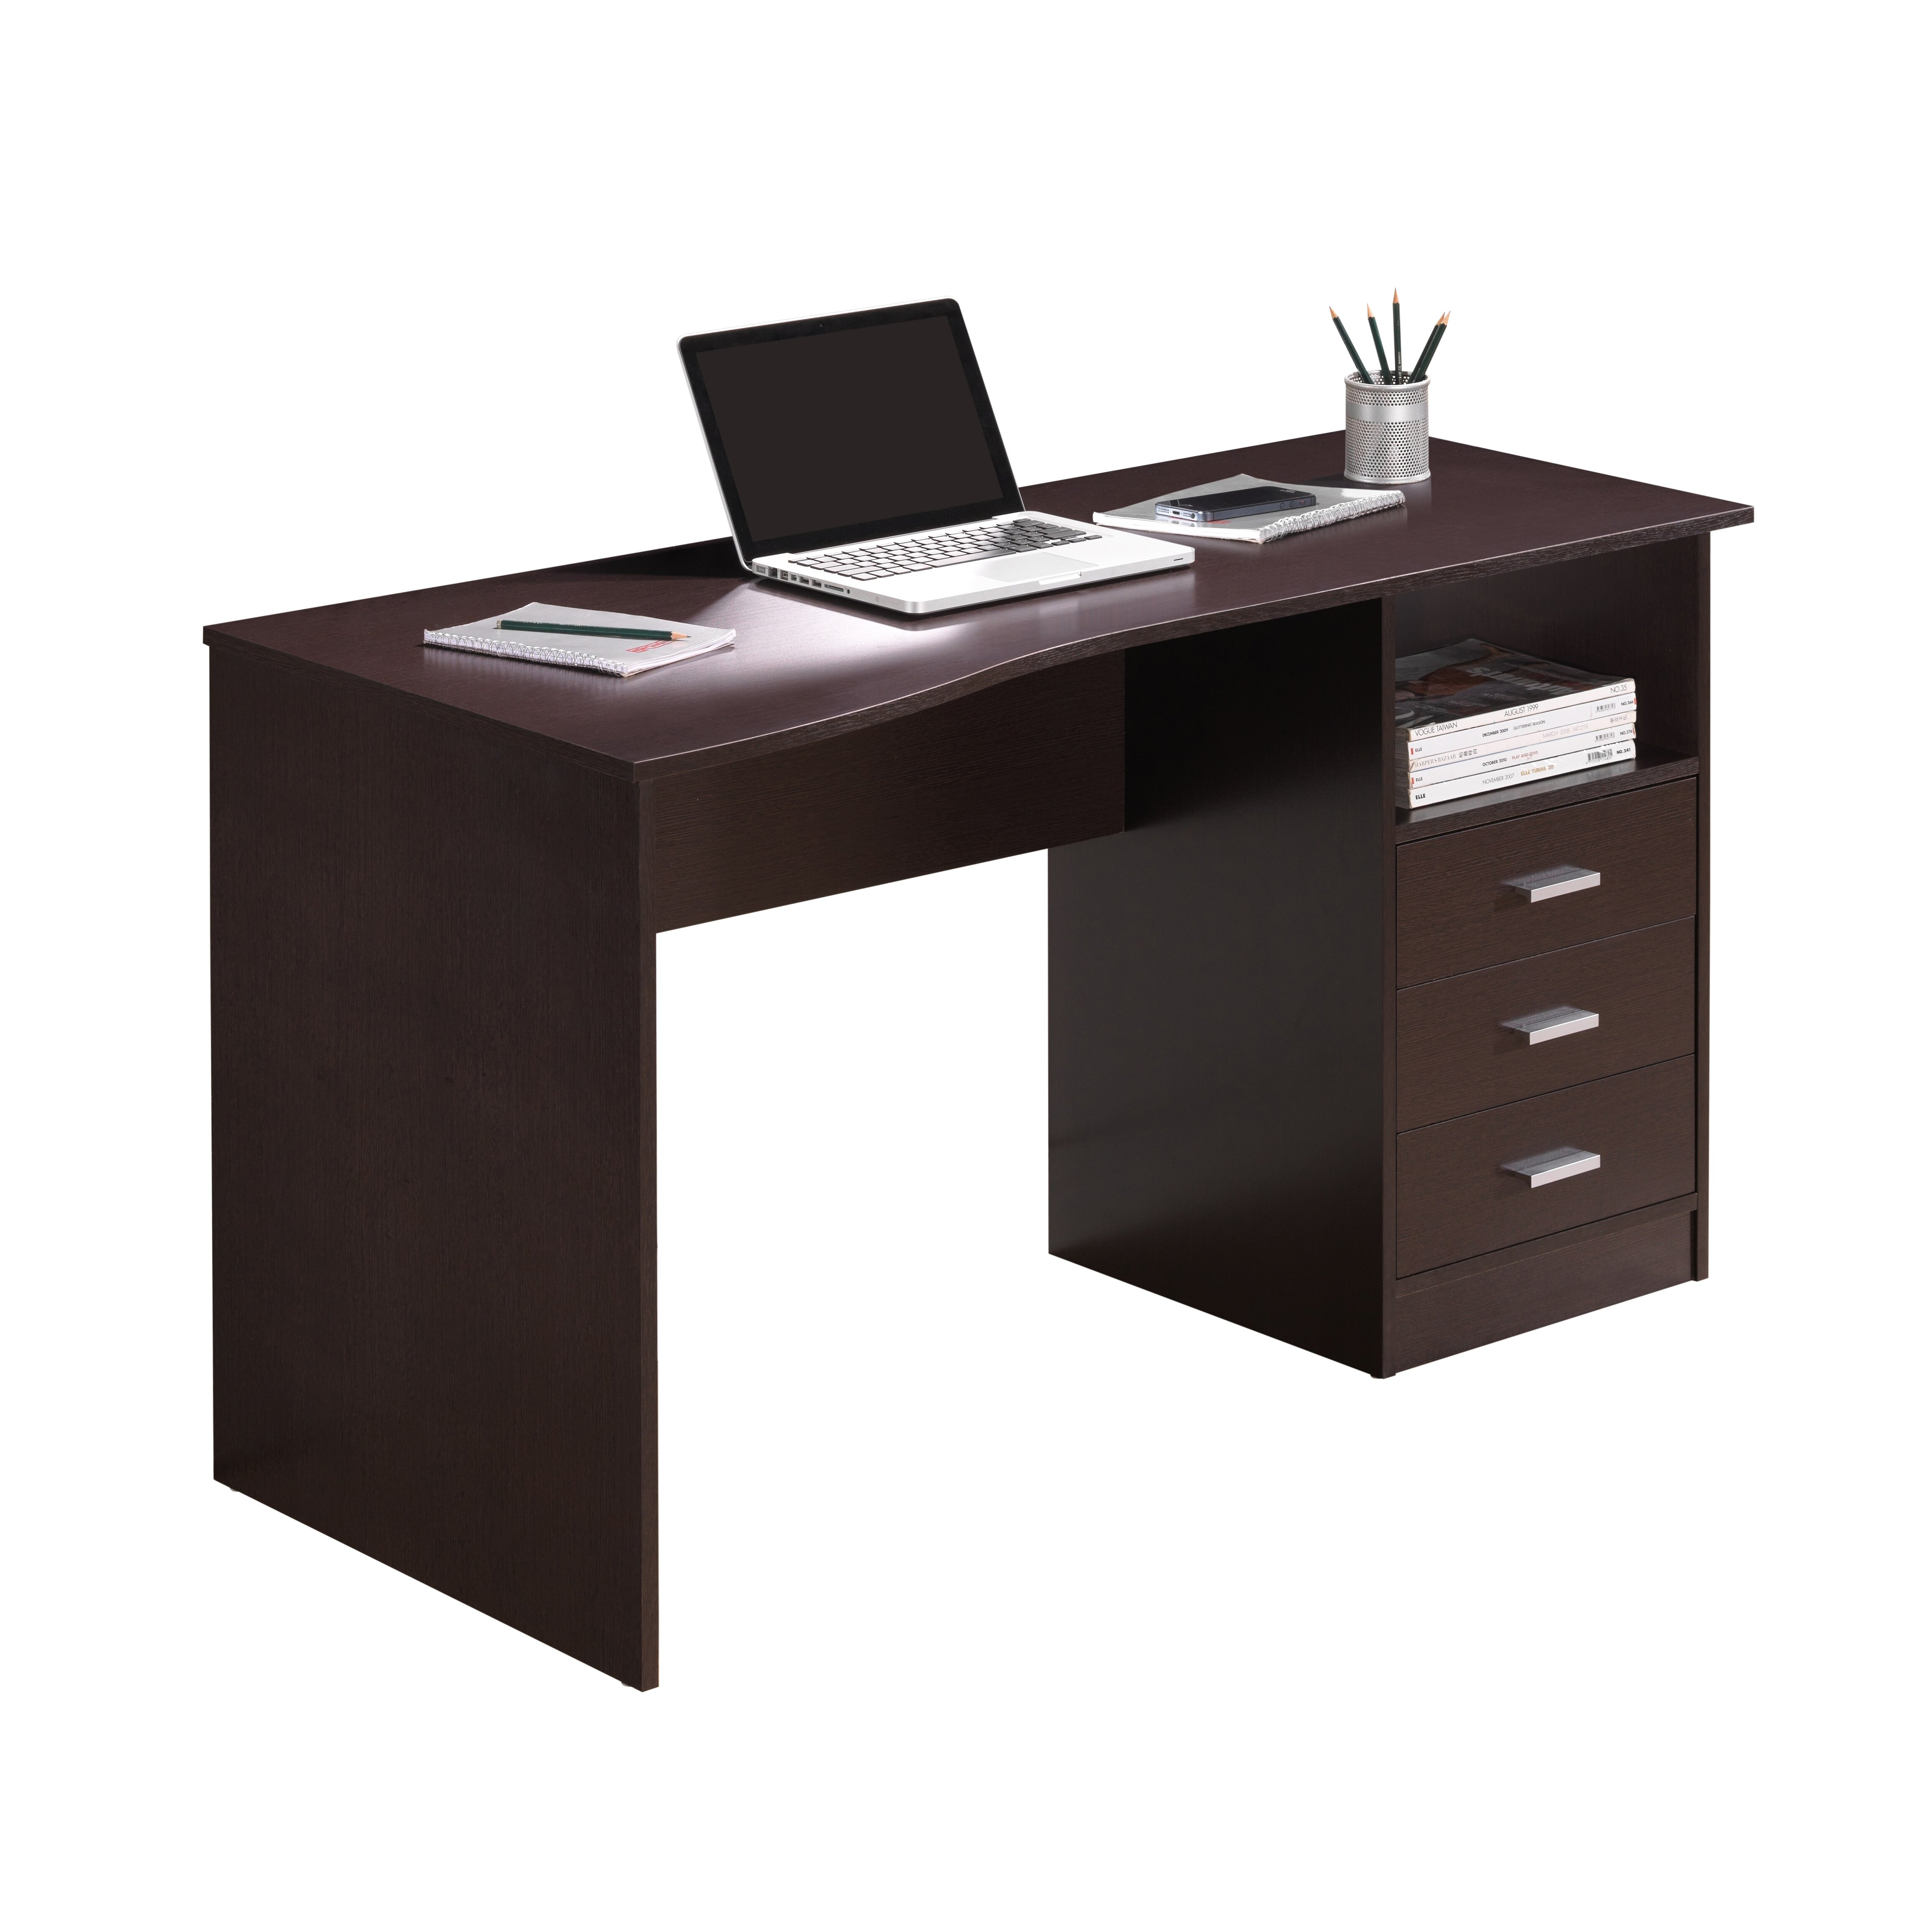 Techni mobili classy computer desk reviews wayfair for Oficina depot